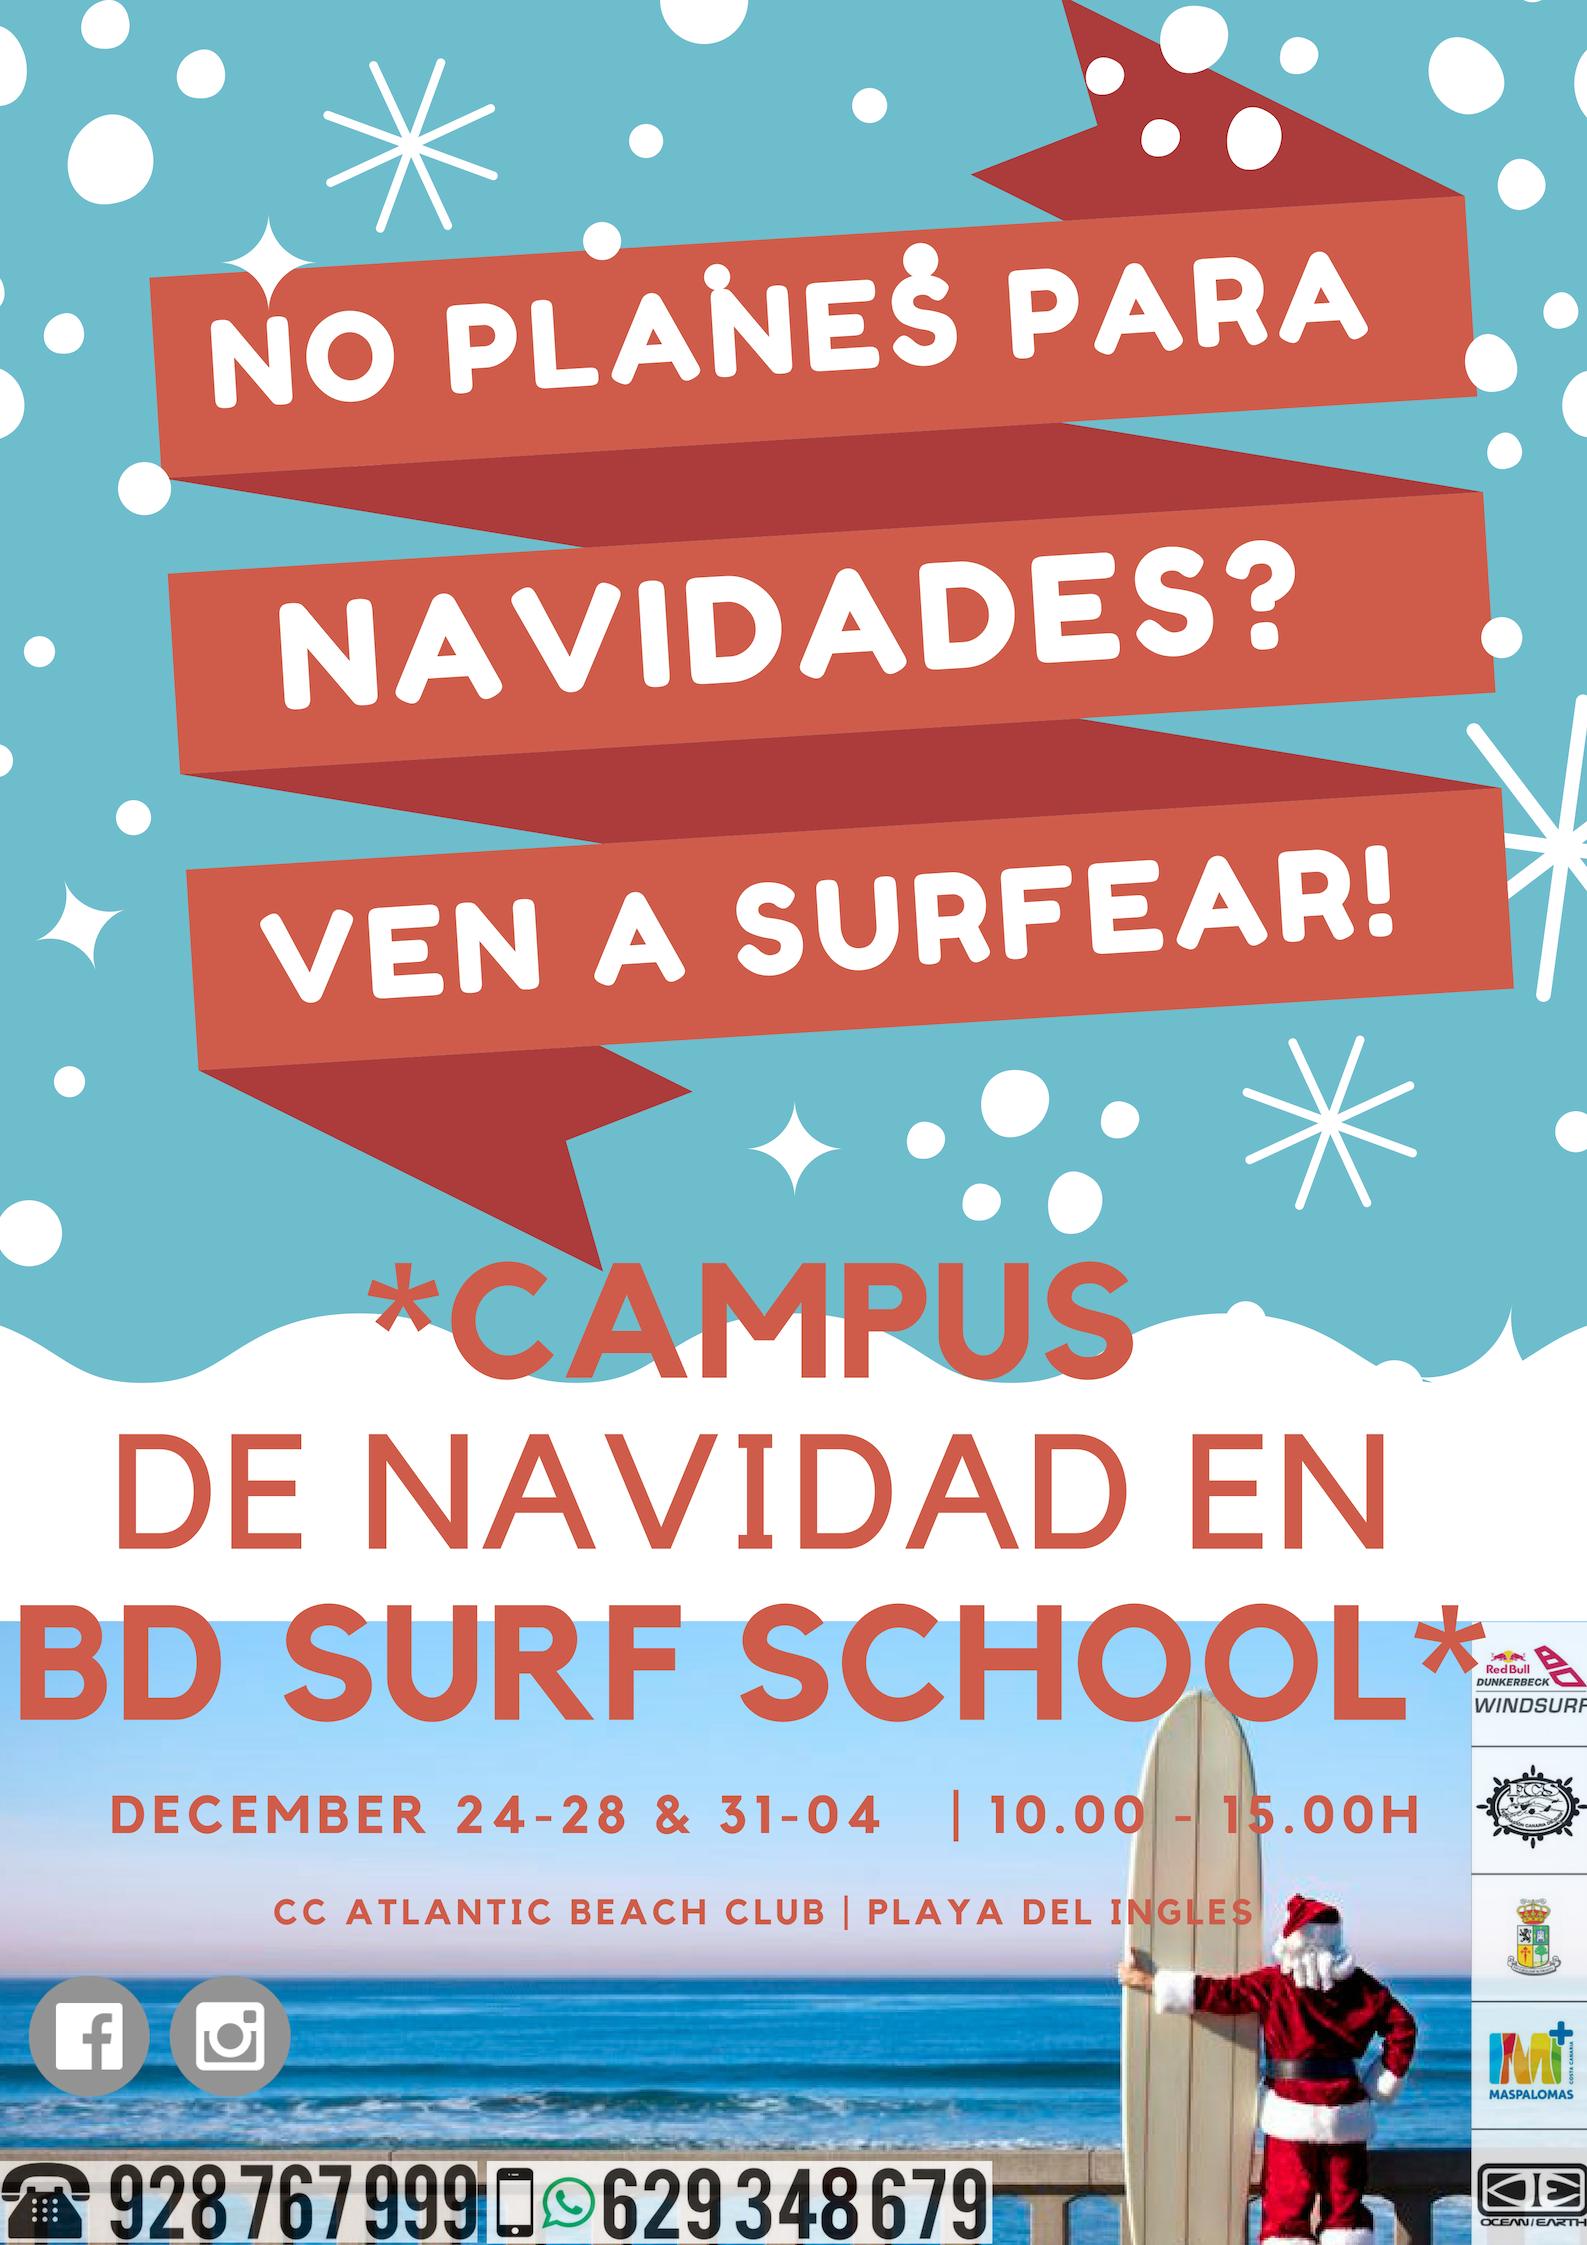 campus de navidad Dunkerbeck surf school